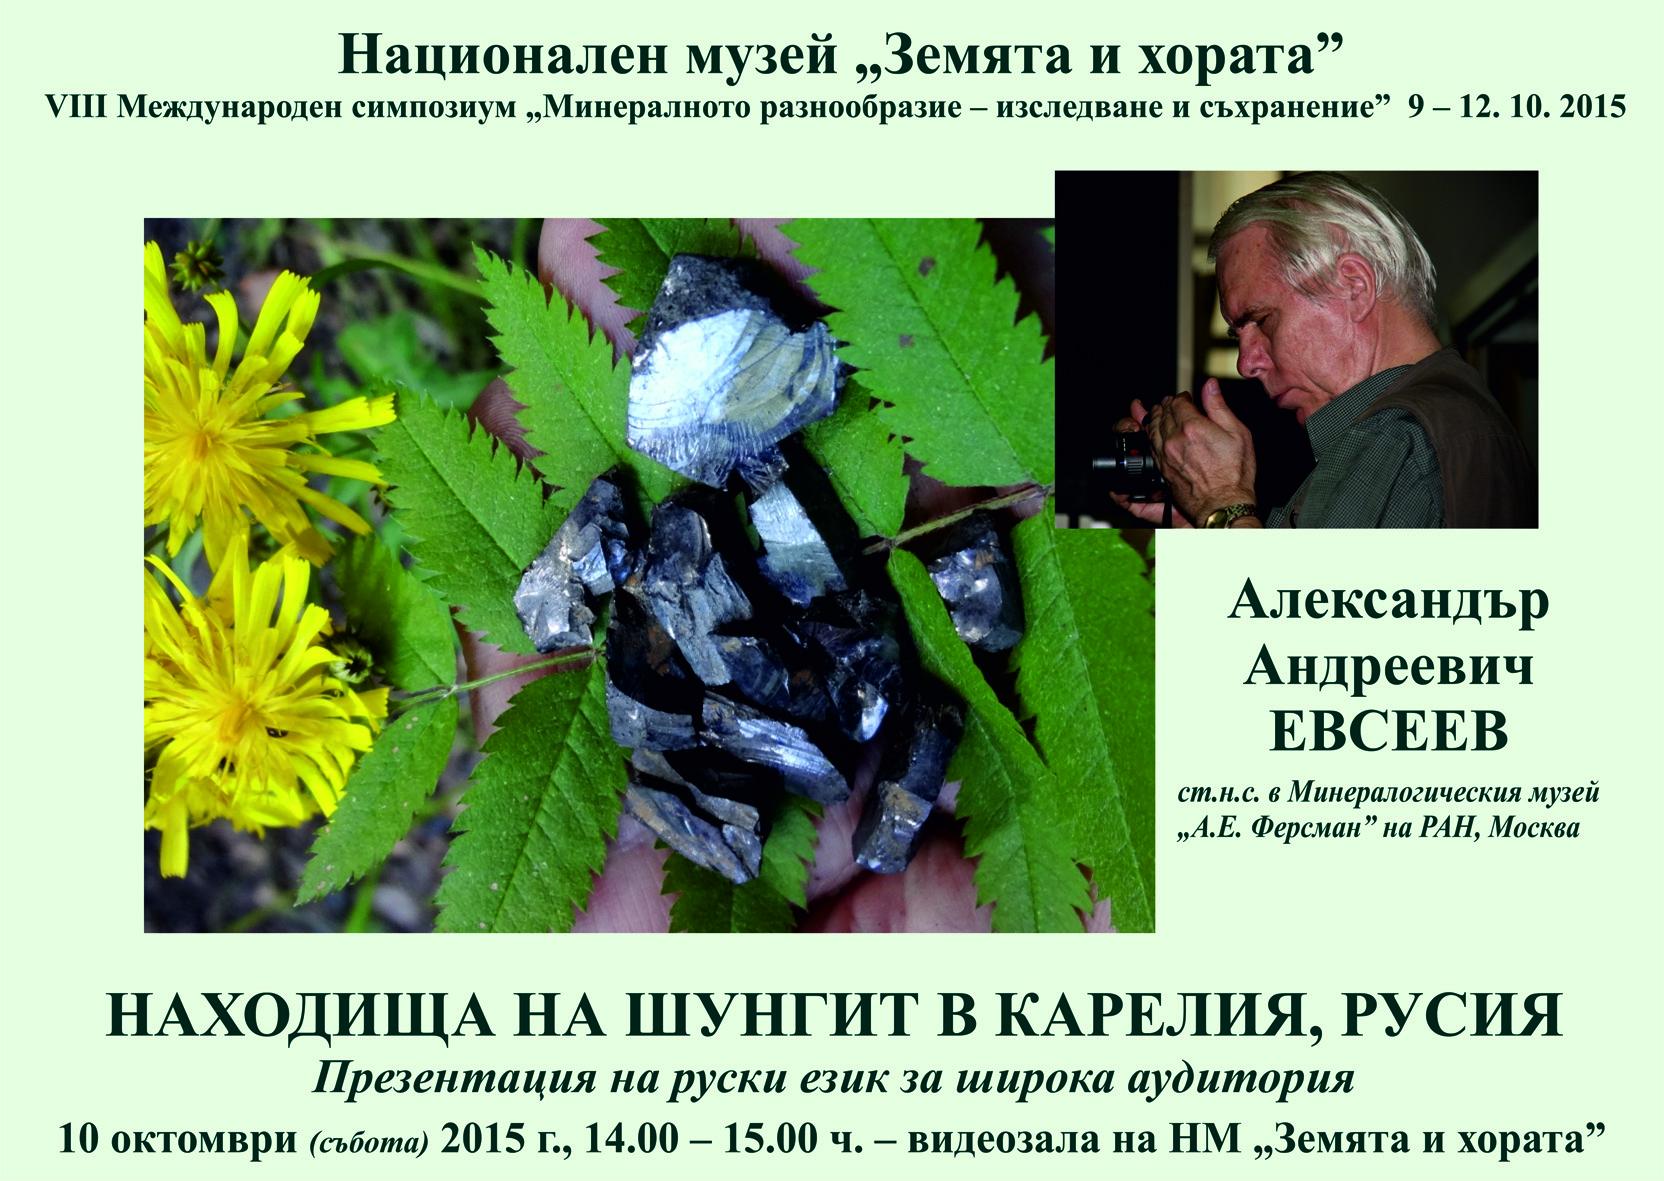 Plakat Evseev